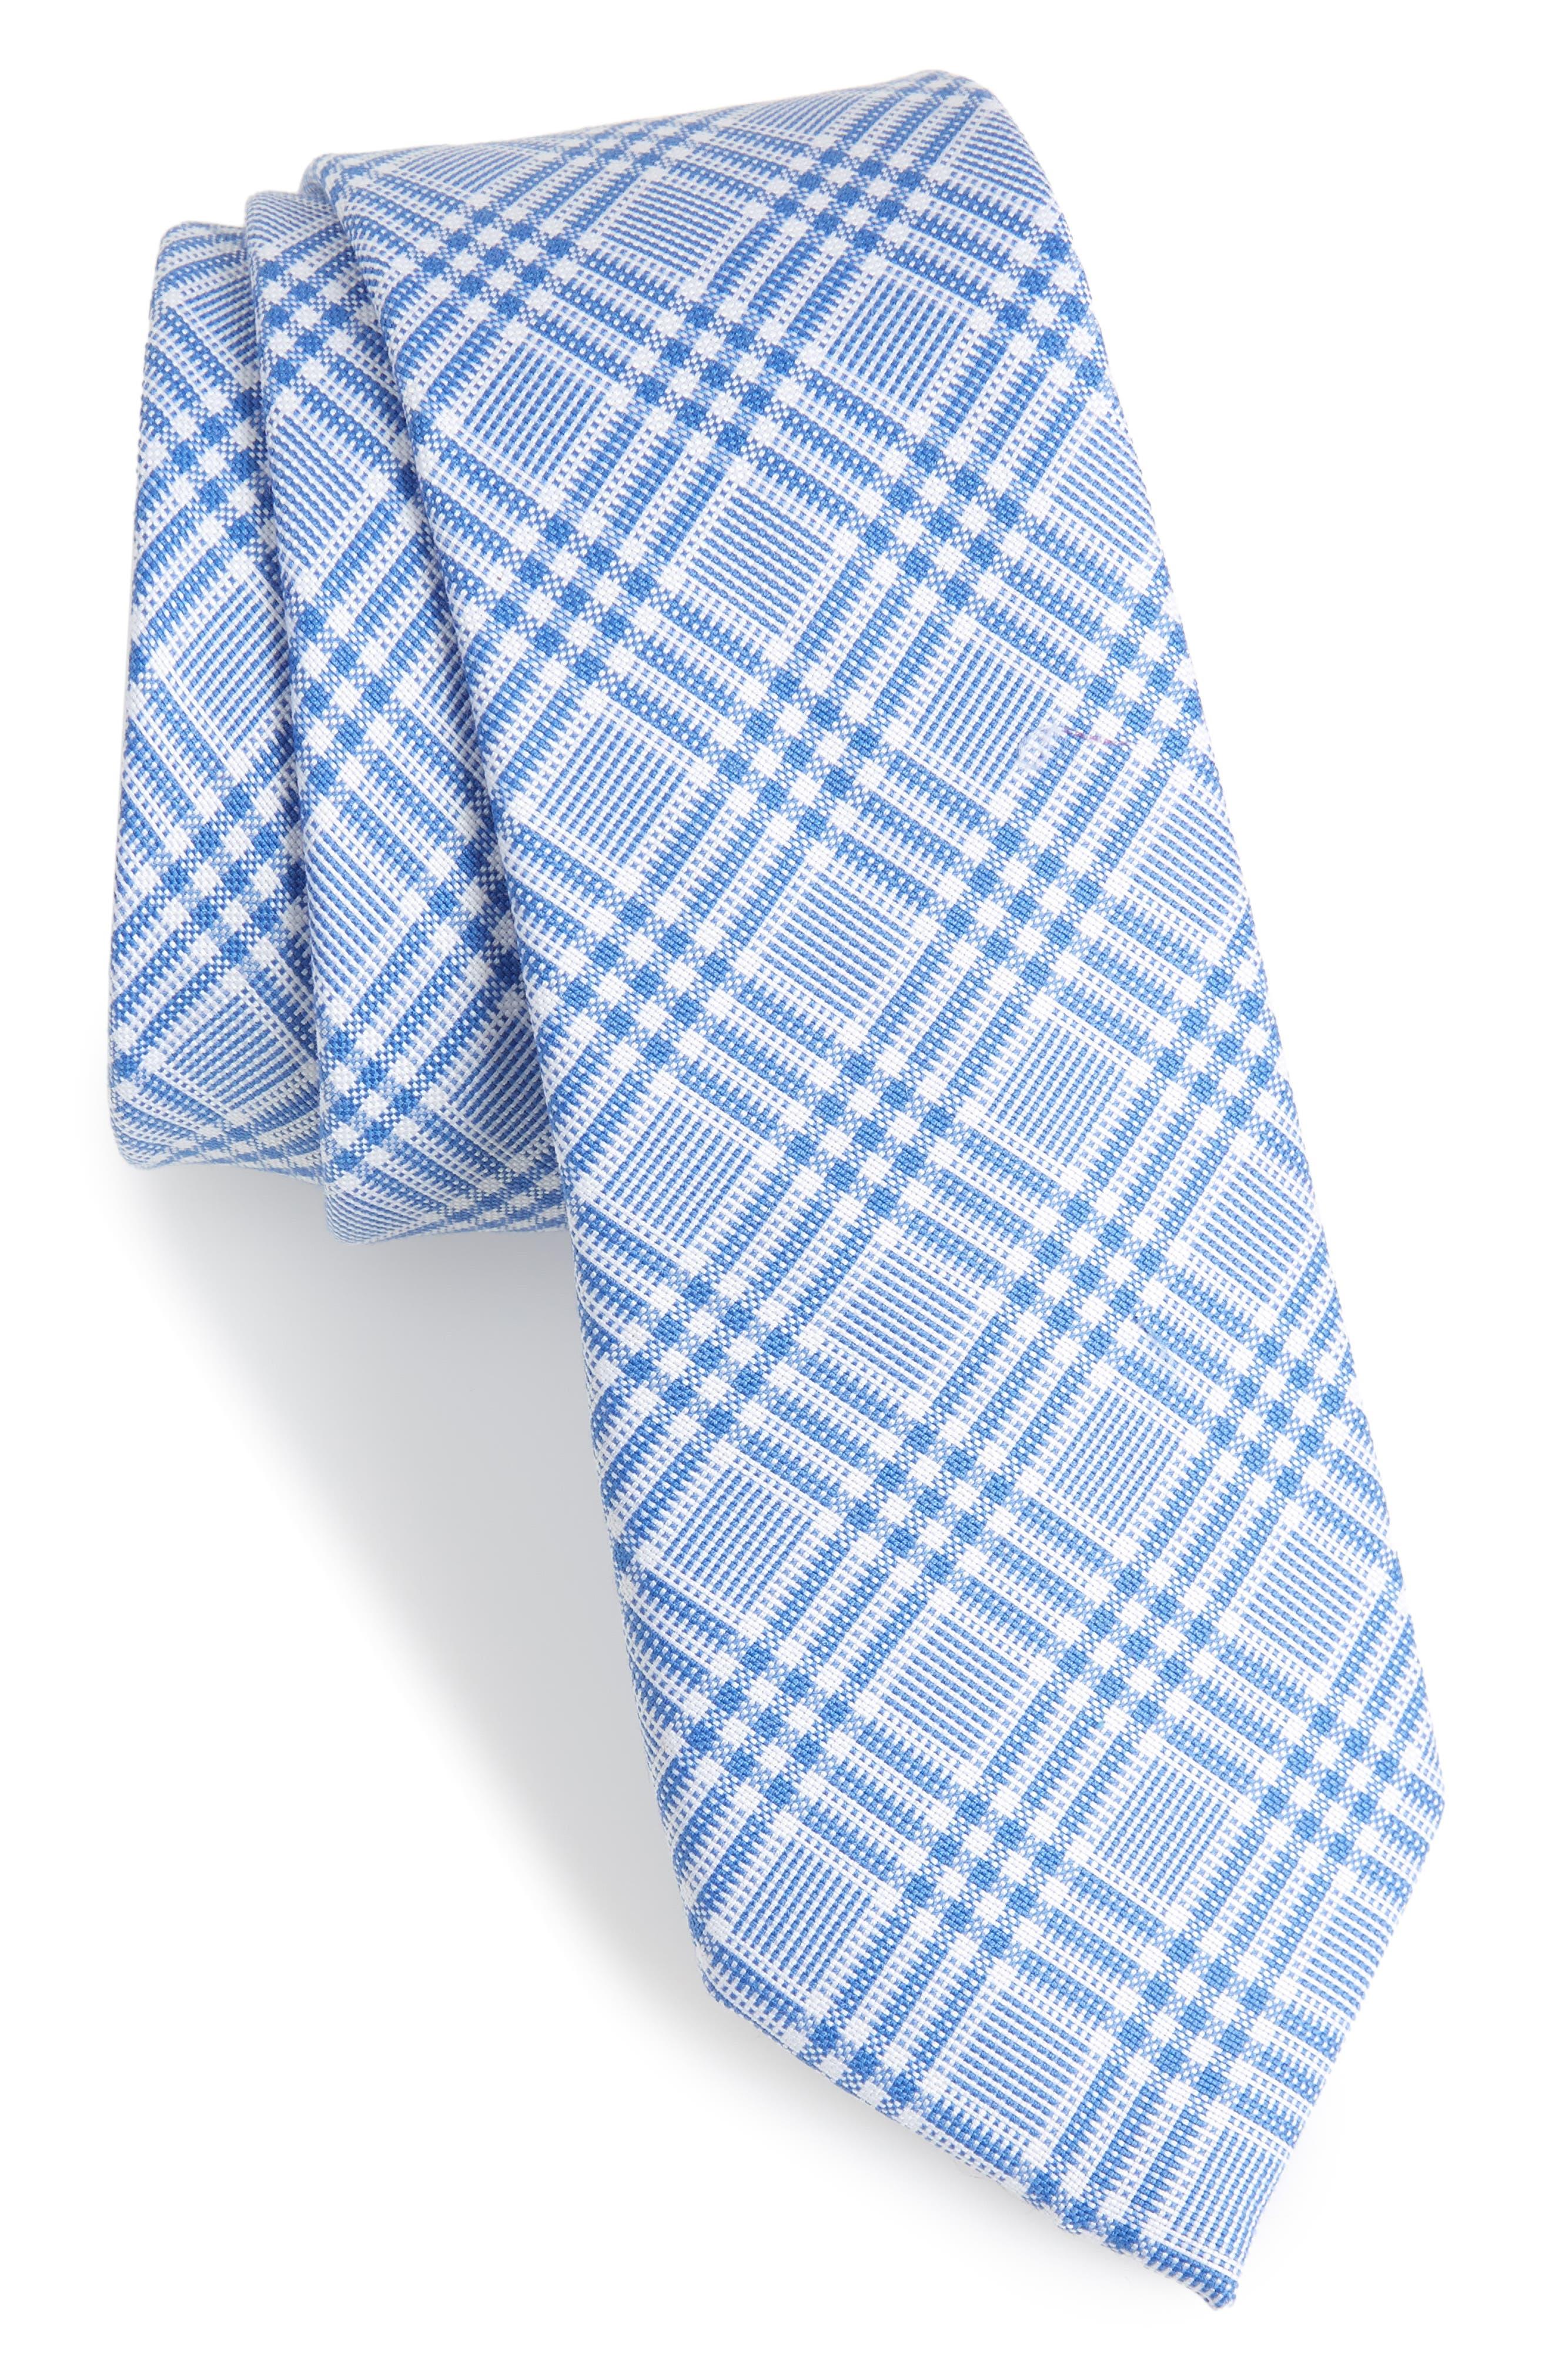 Brook Plaid Cotton Skinny Tie,                             Main thumbnail 1, color,                             400